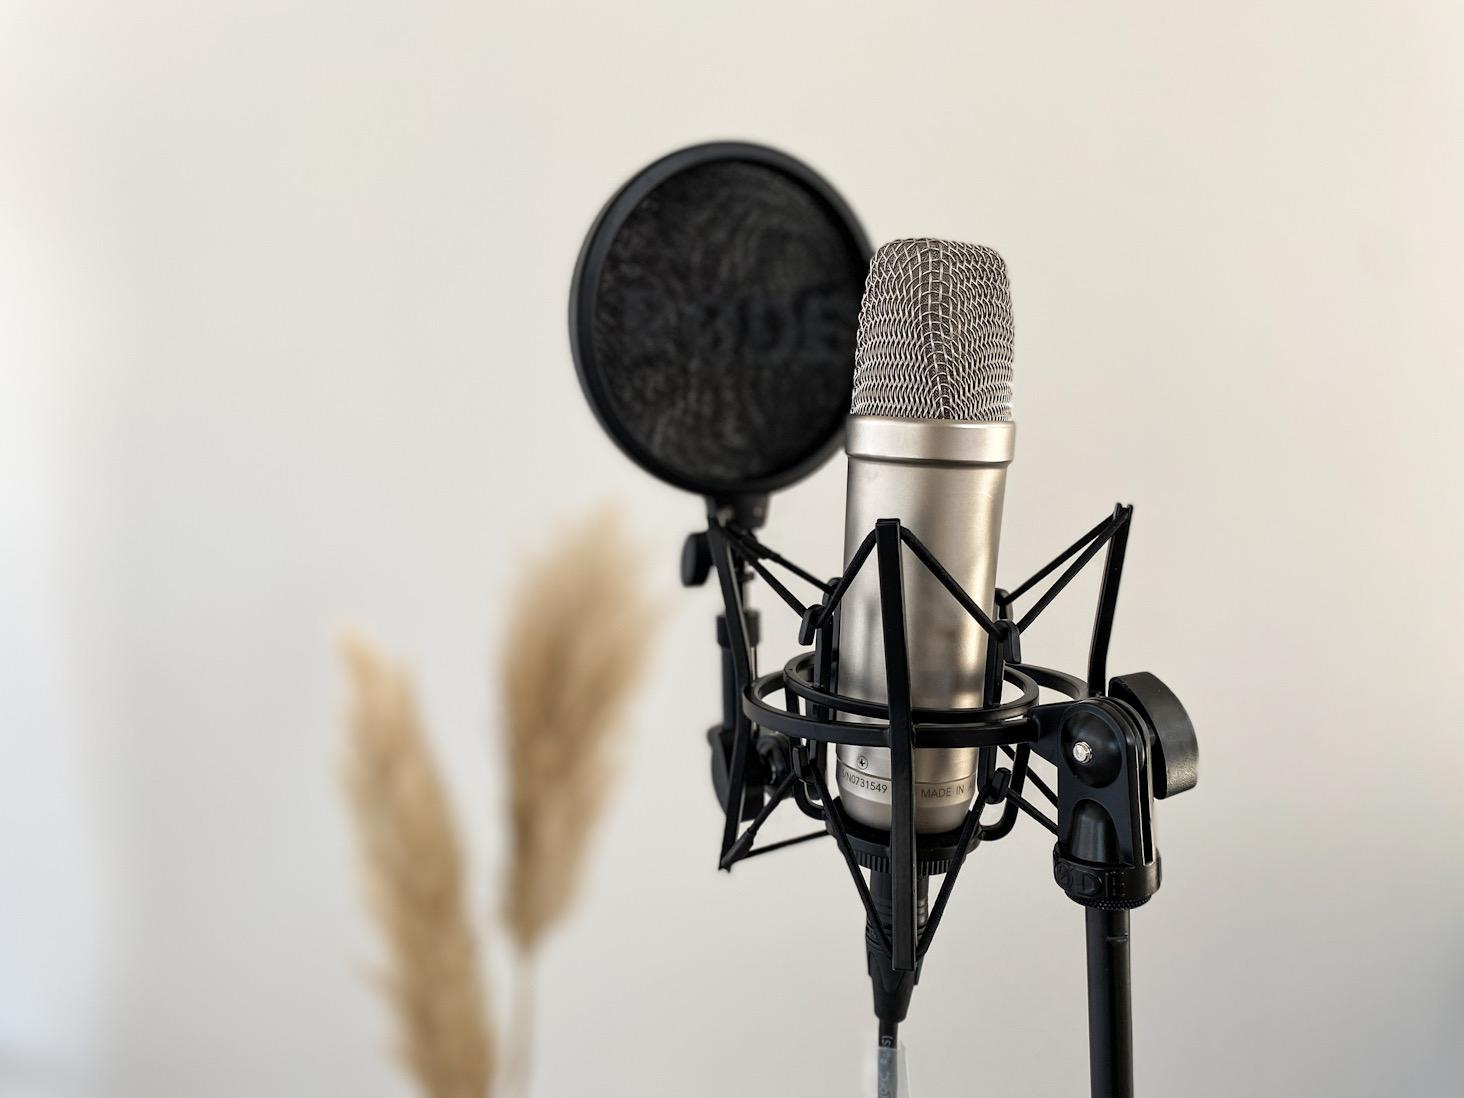 Rode-mikrofoni